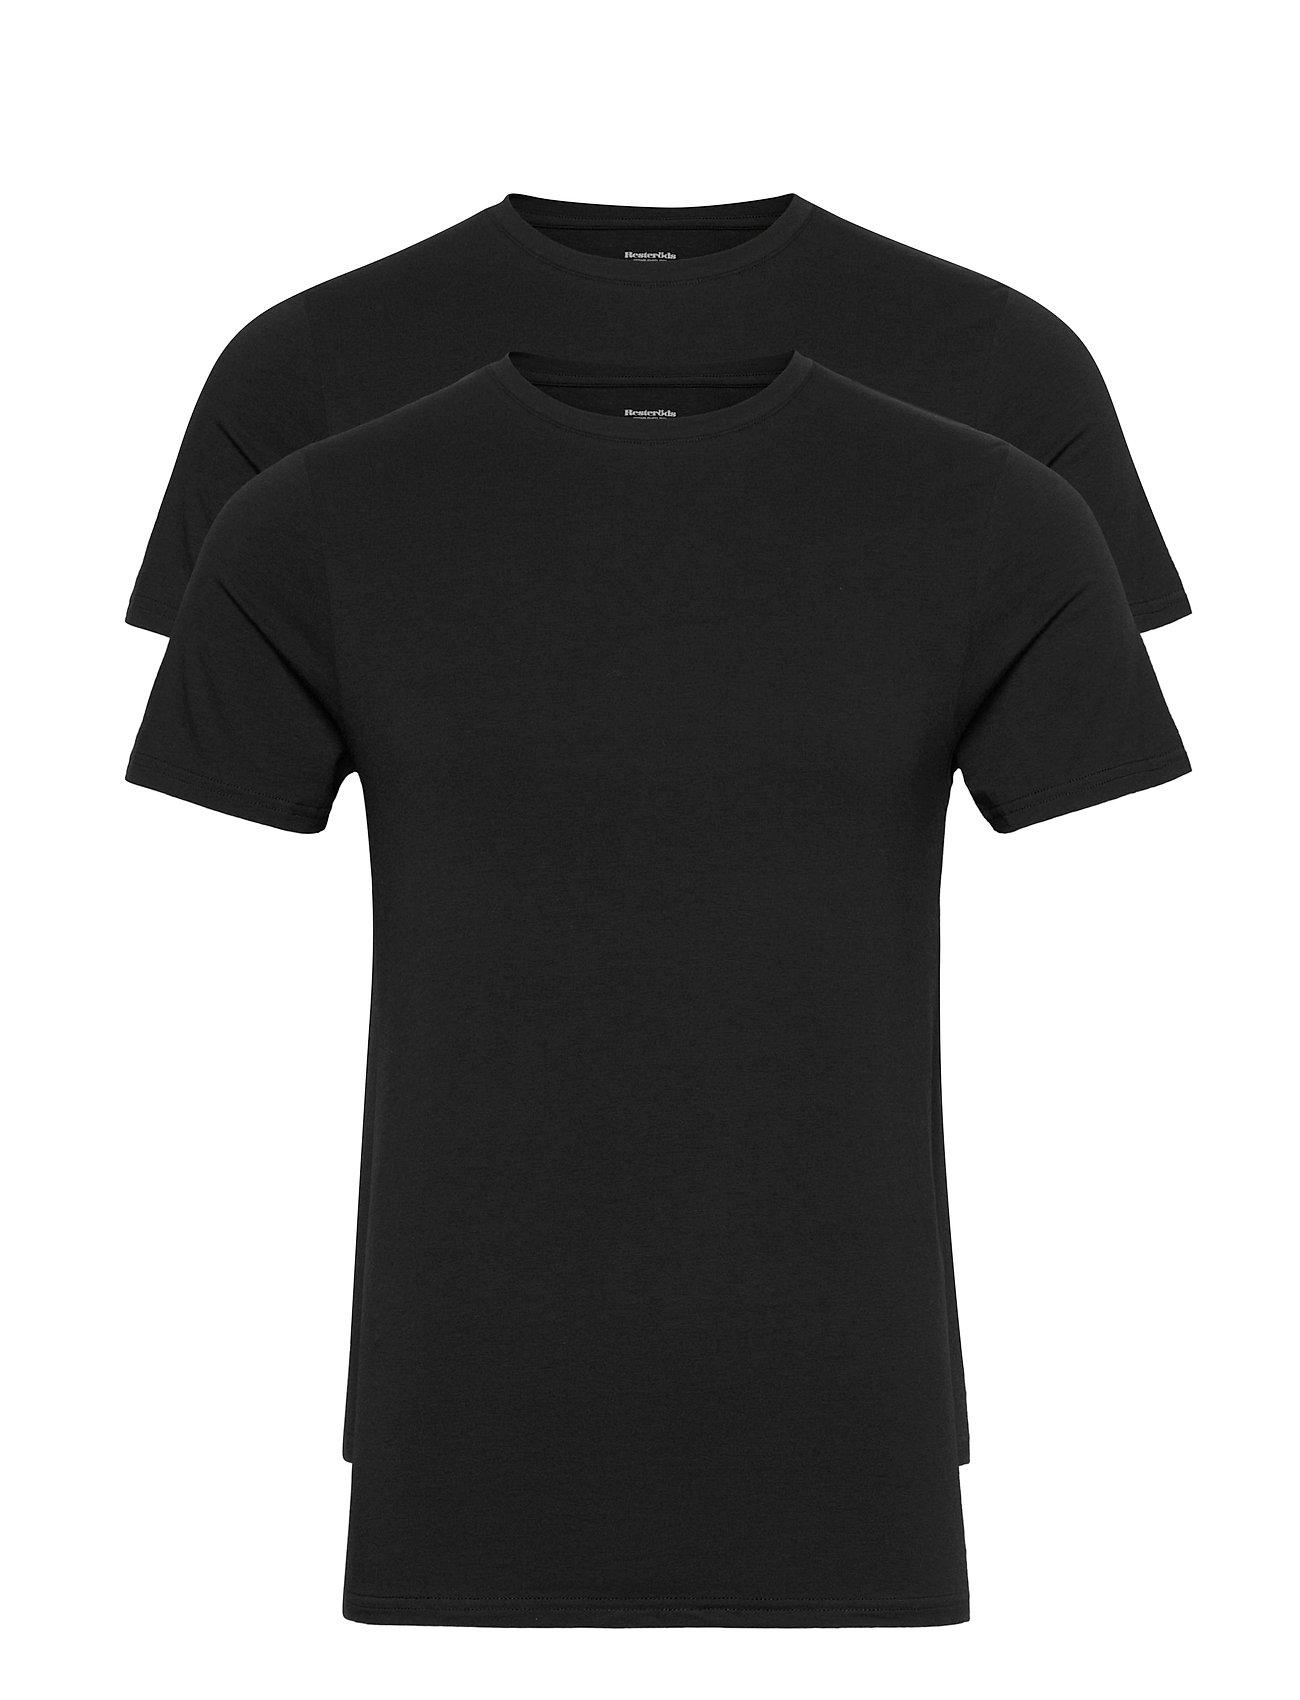 Image of Bamboo 2-Pack Tee T-shirt Sort Resteröds (3457408811)